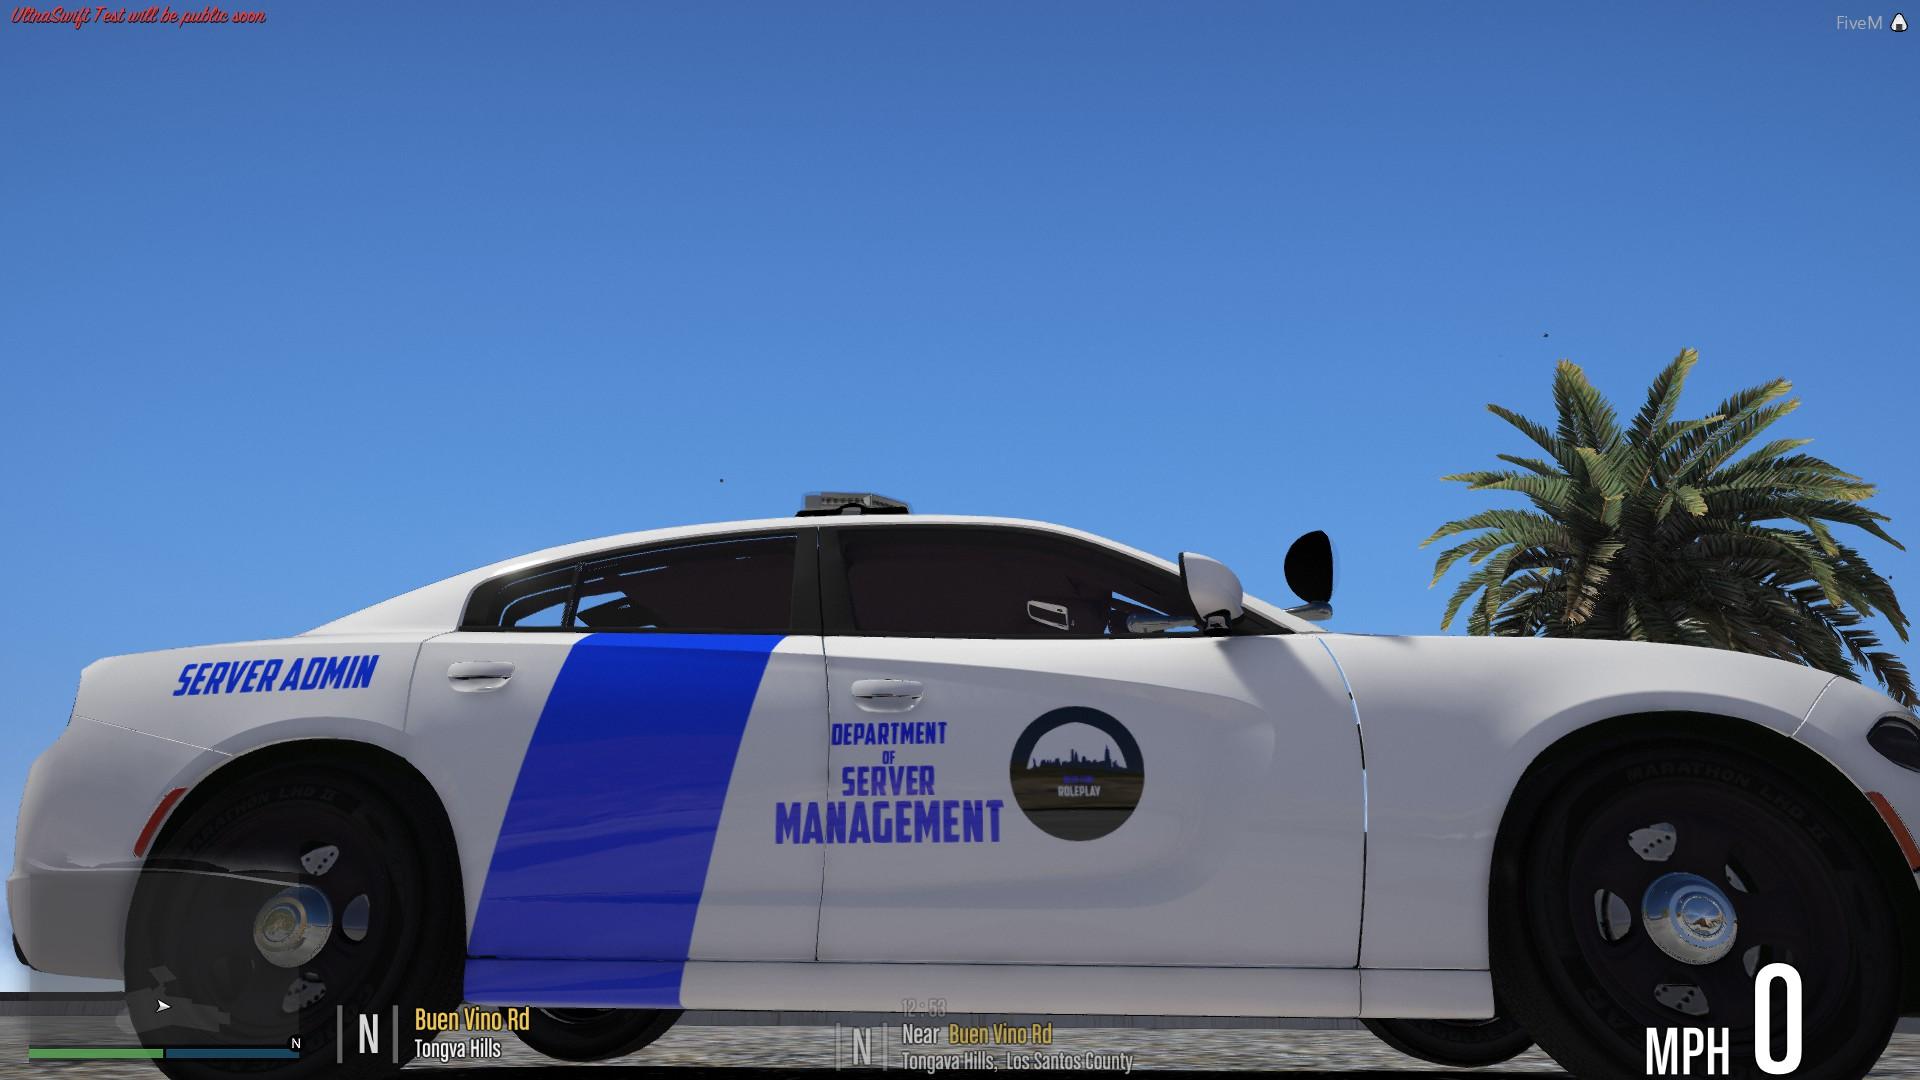 Release] Admin Car Livery + PSD - Releases - FiveM